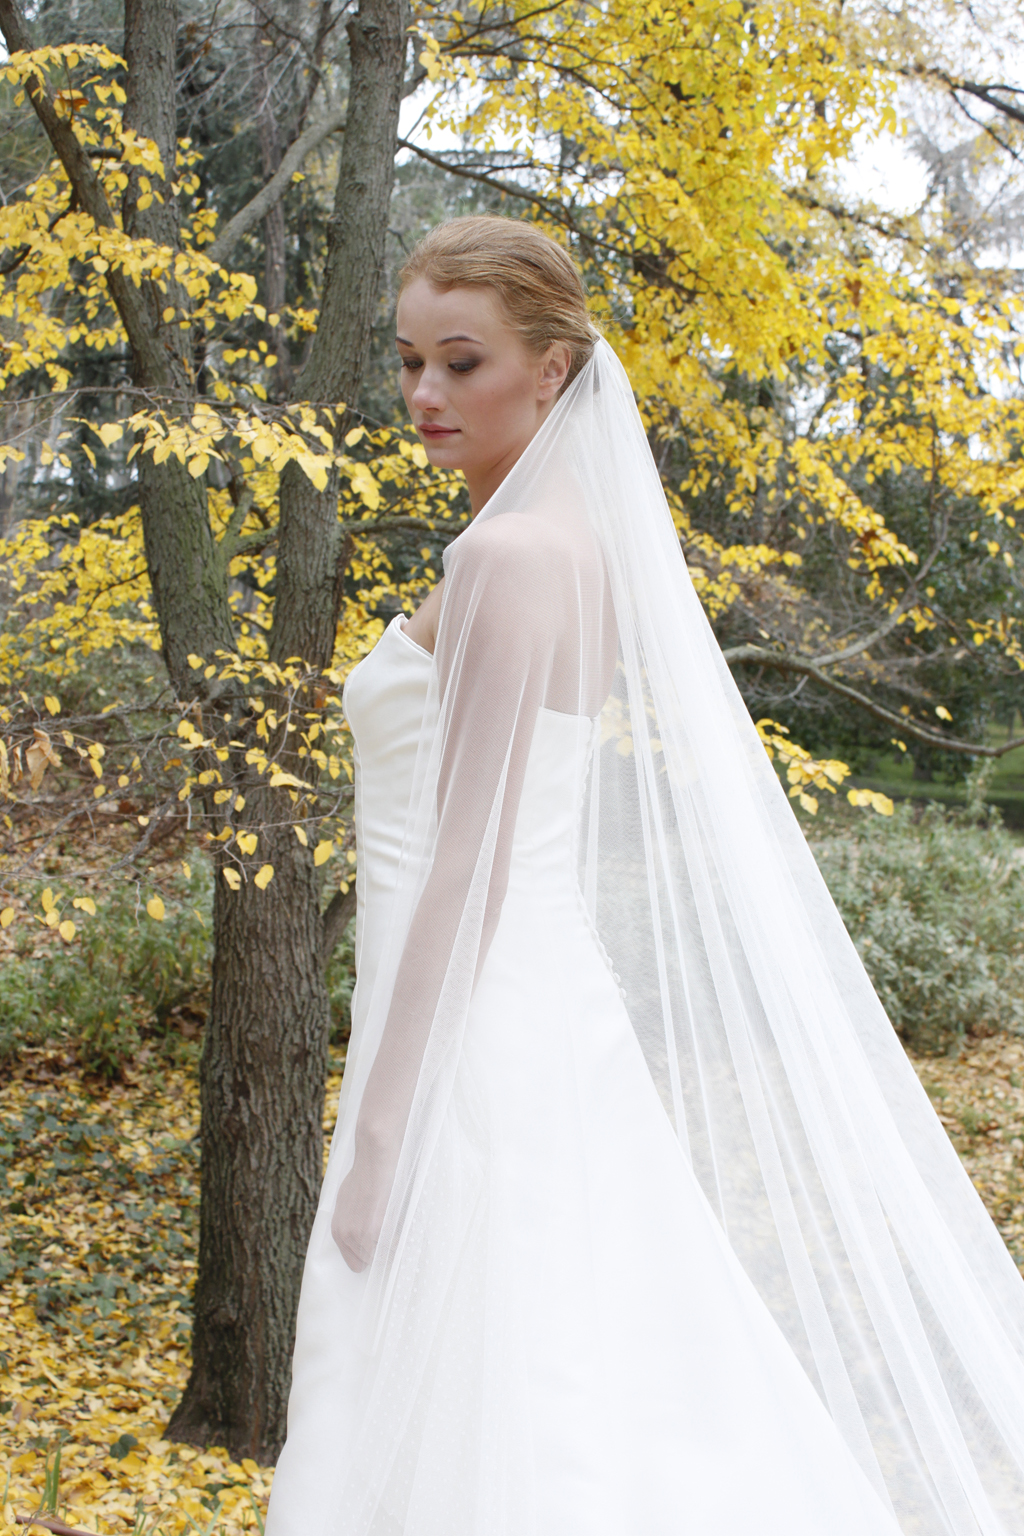 vestido de novia palabra de honor plume - masum karimi